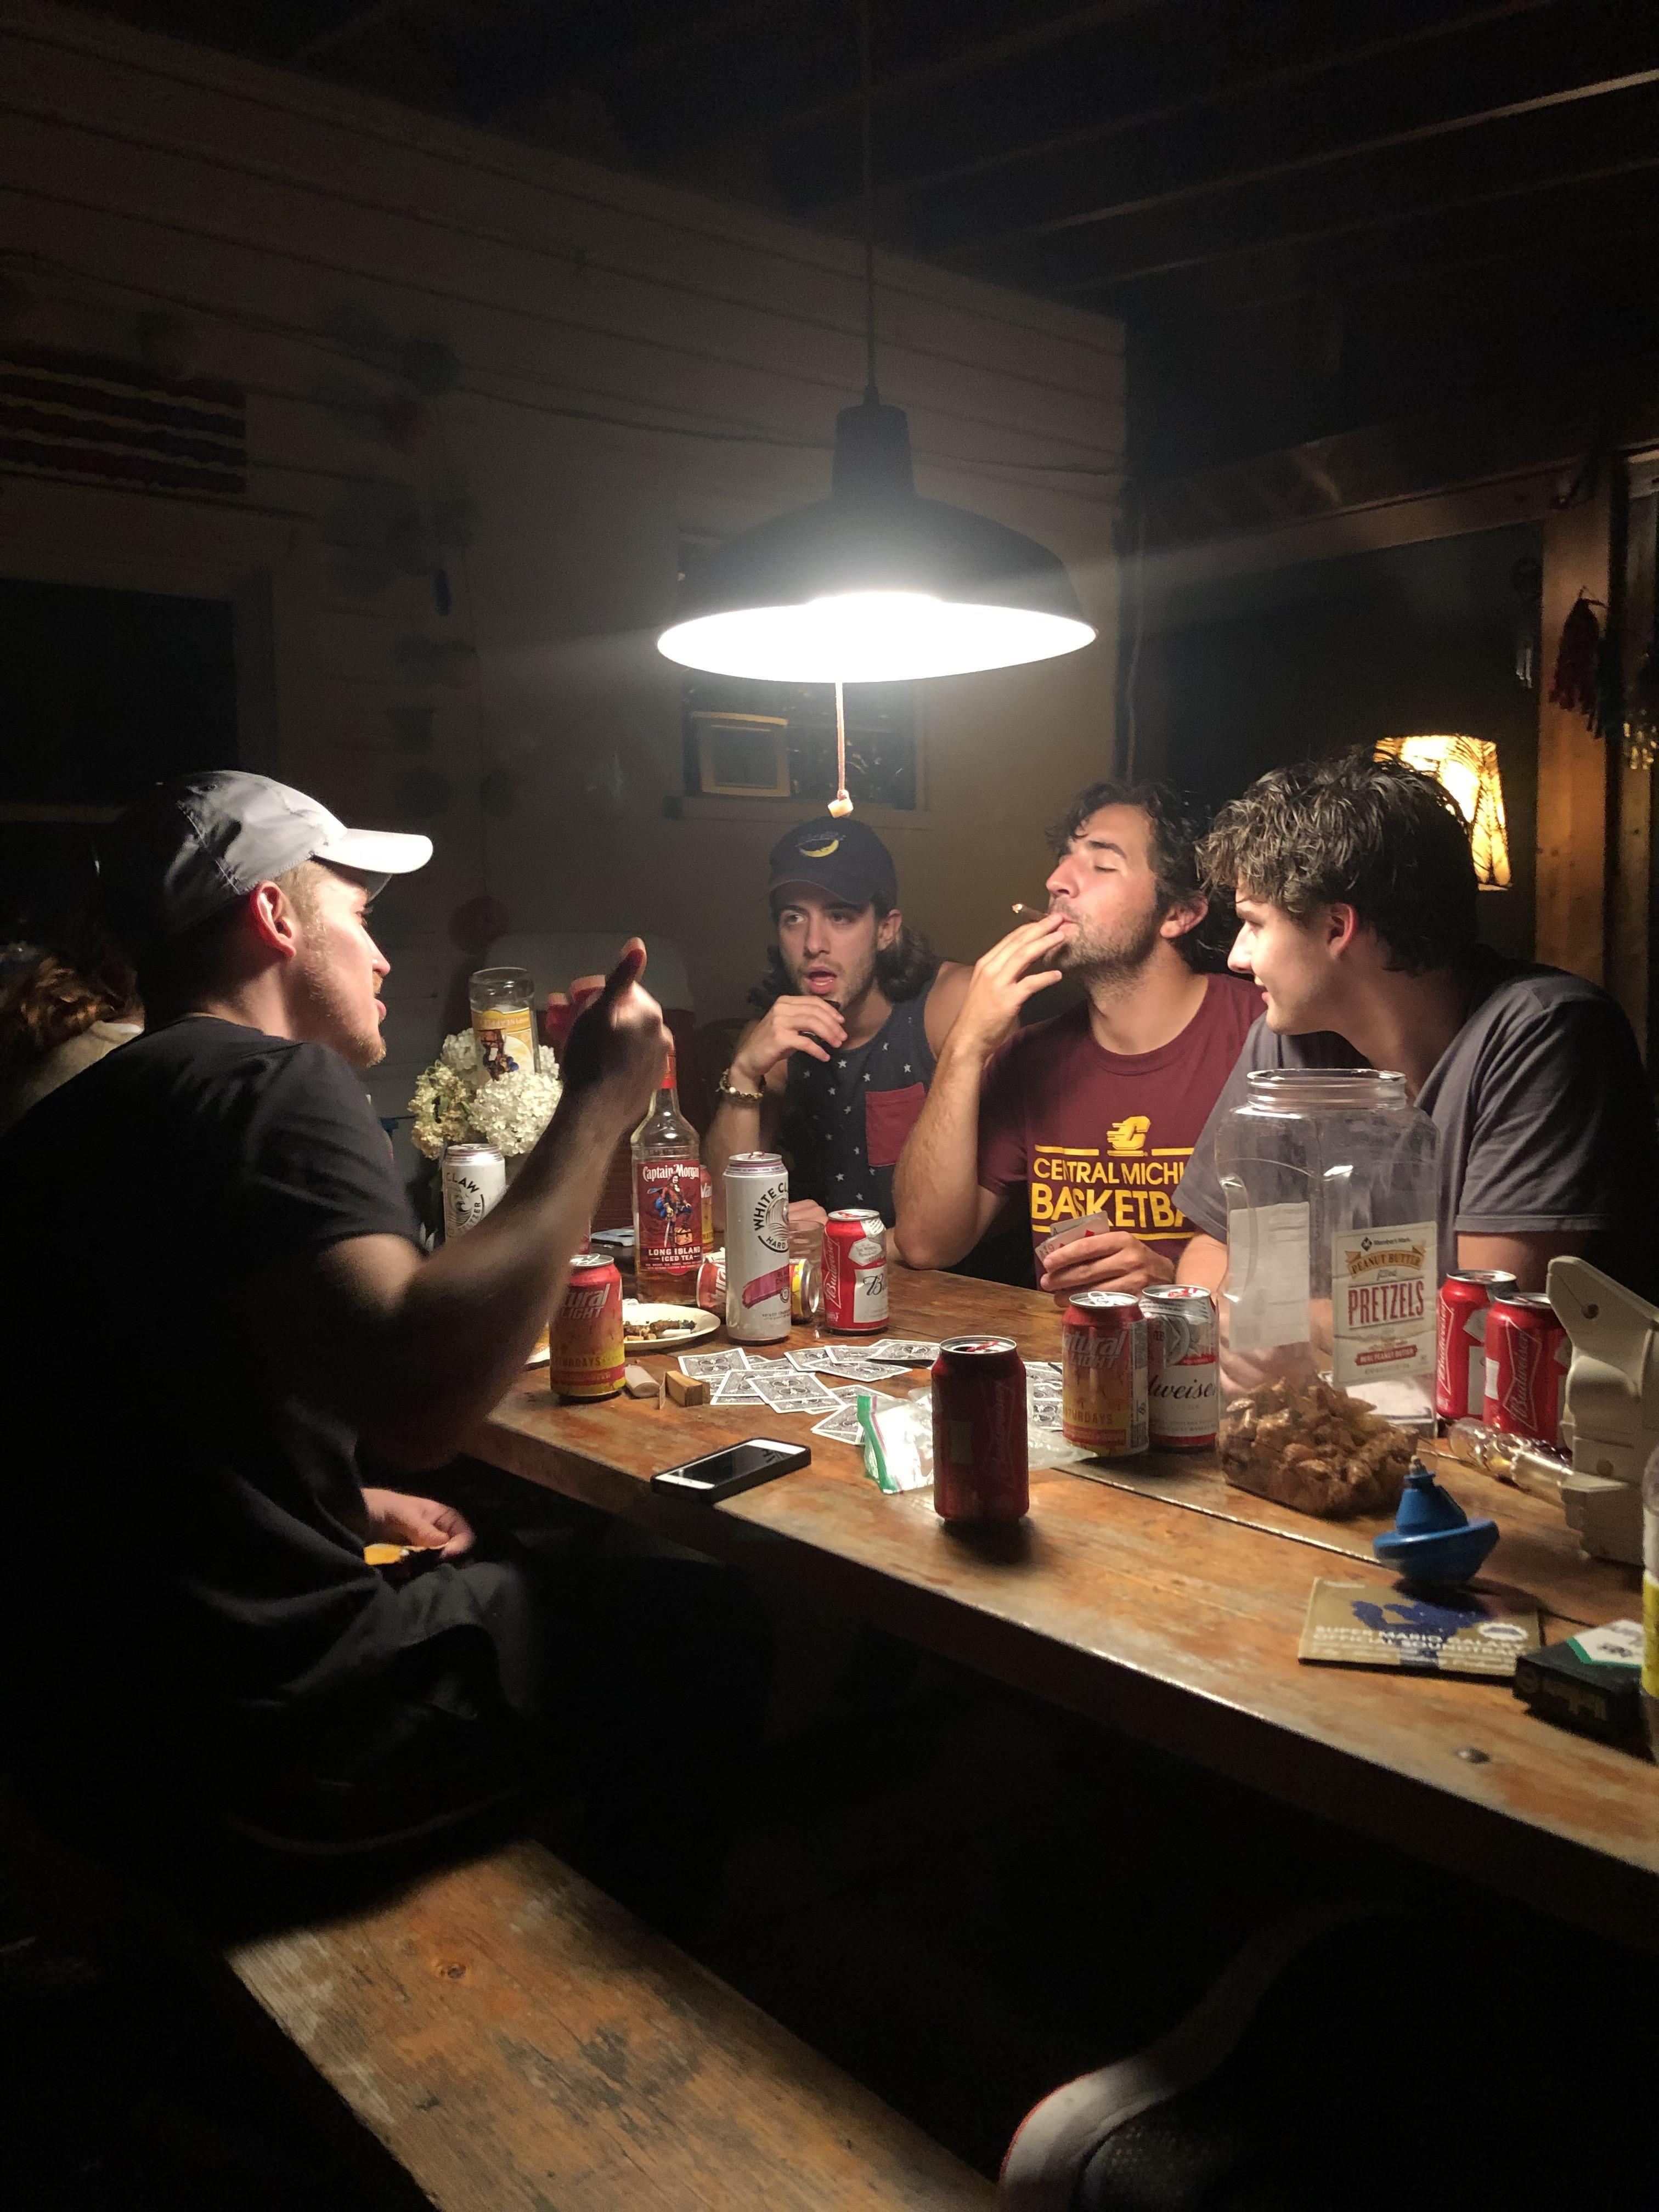 """Late night chat"" art photography AccidentalRenaissance"